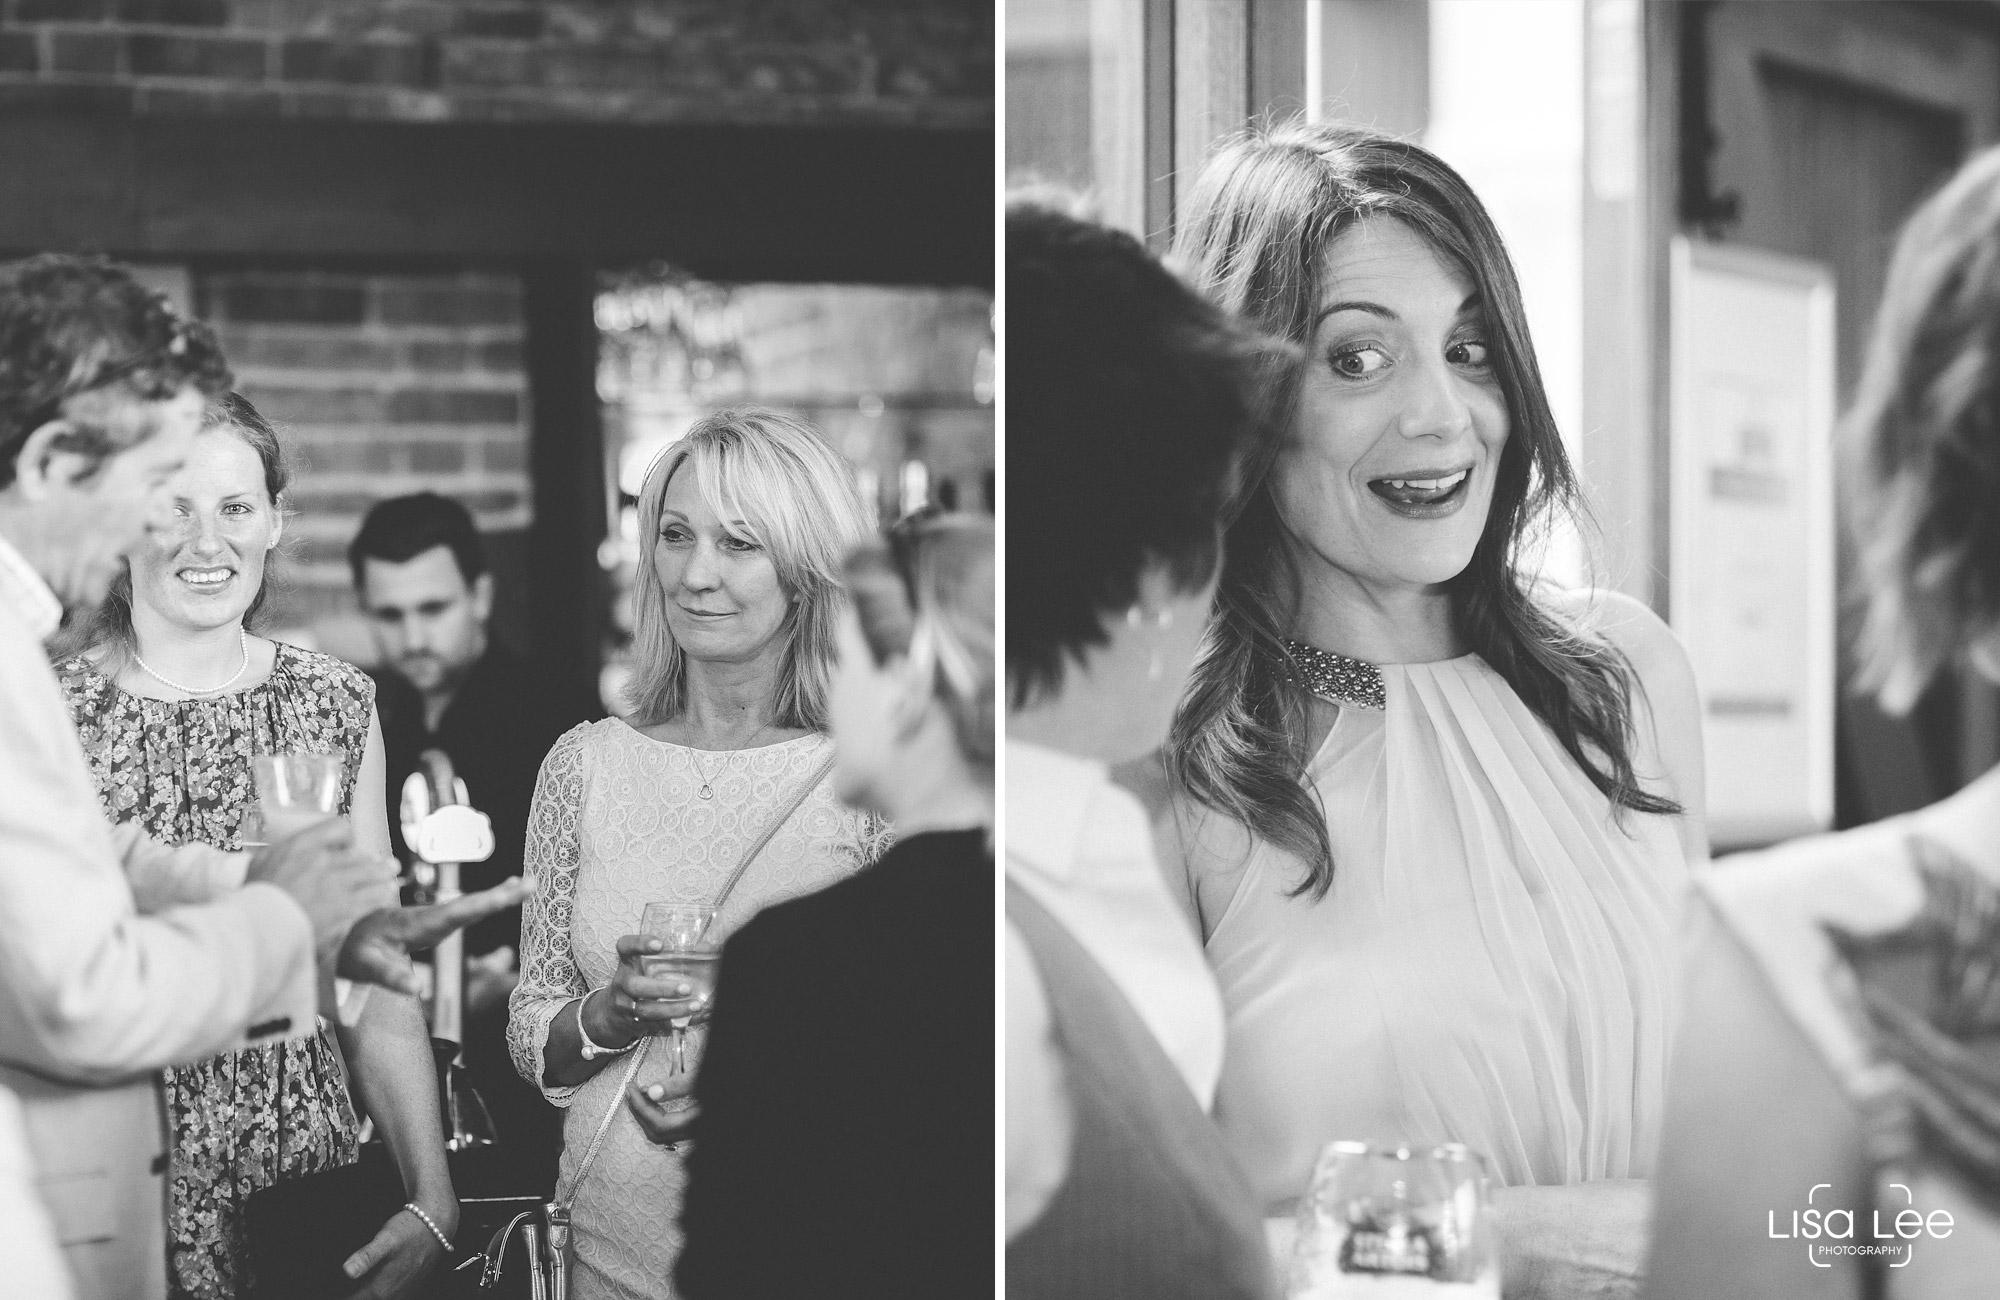 lisa-lee-wedding-photography-burton-reception2.jpg